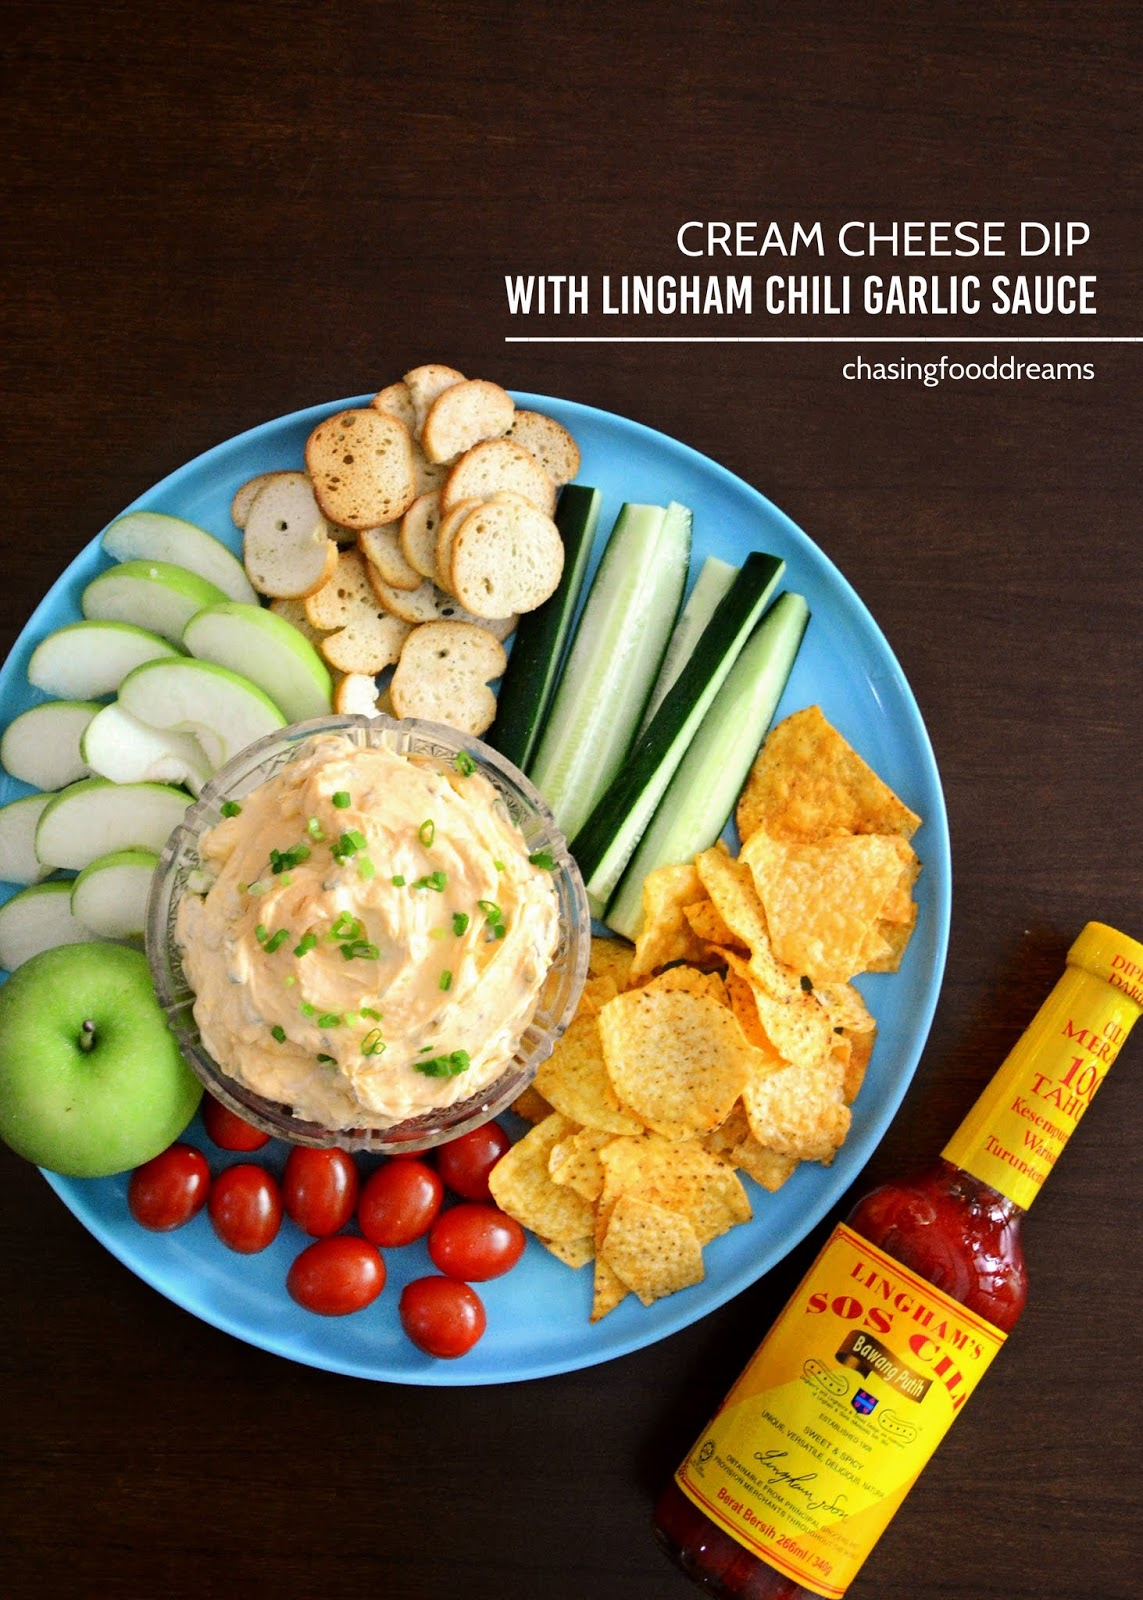 Chasing Food Dreams Recipe Cream Cheese Dip With Lingham Chili Sauce Sambal Cuk Travel Pack Bawang